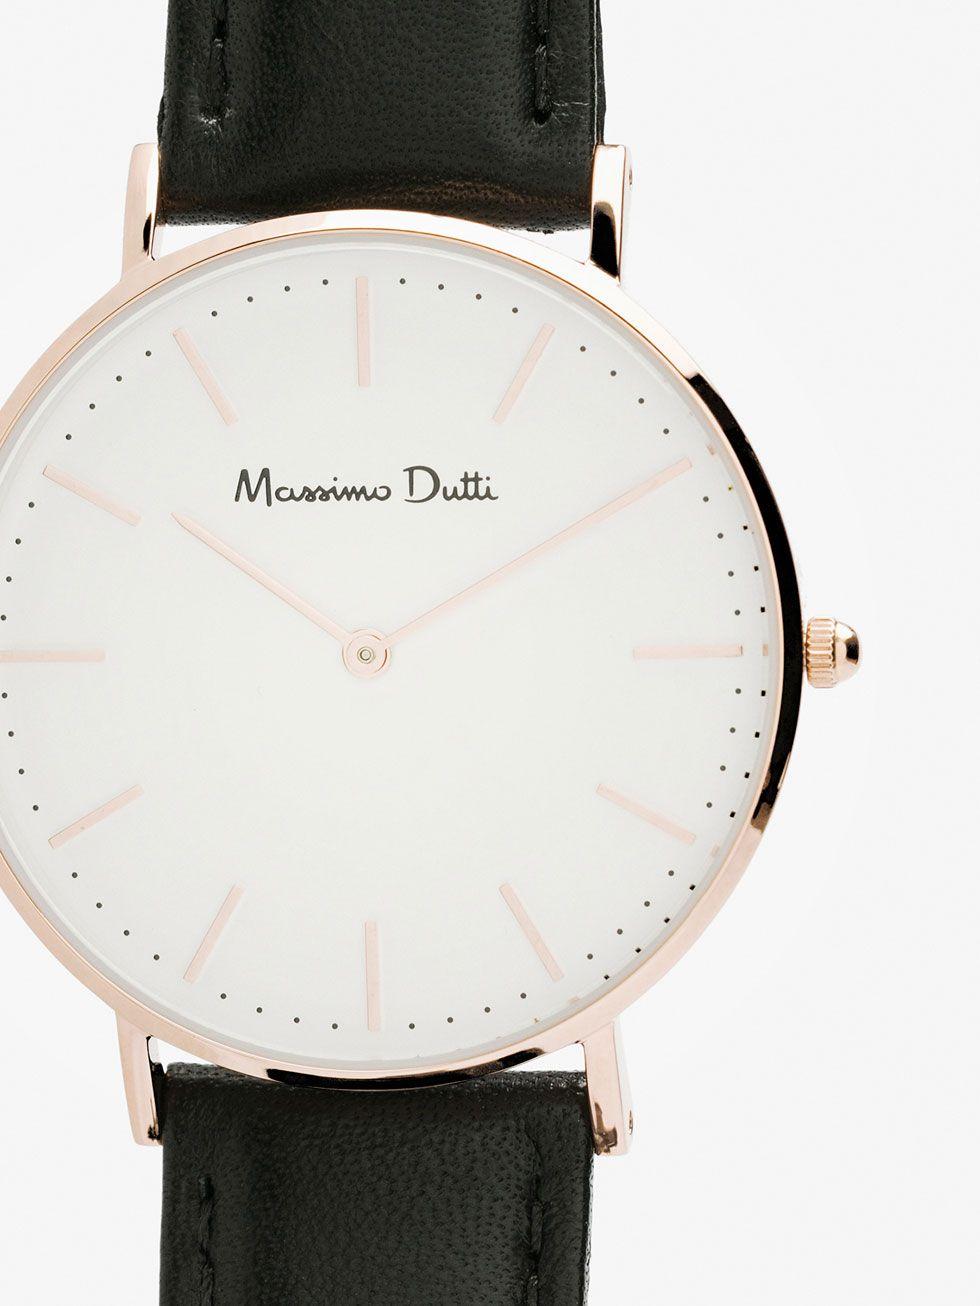 Relojes mujer massimo dutti